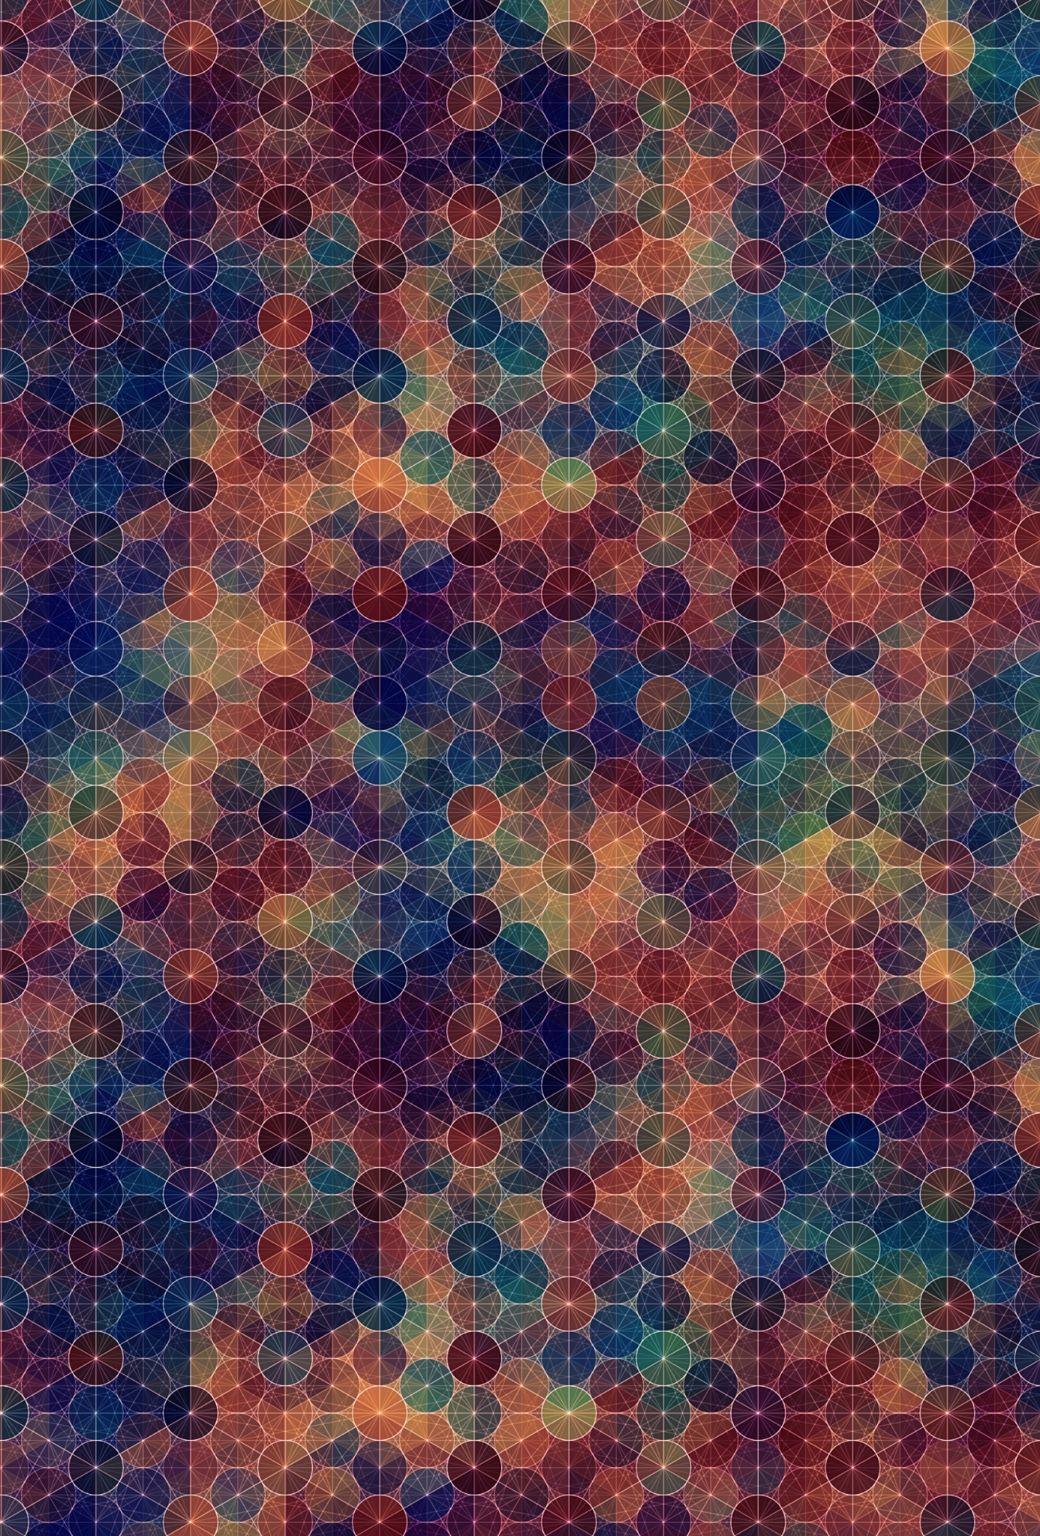 Hd wallpaper pinterest - Geometric Abstract Iphone Wallpaper